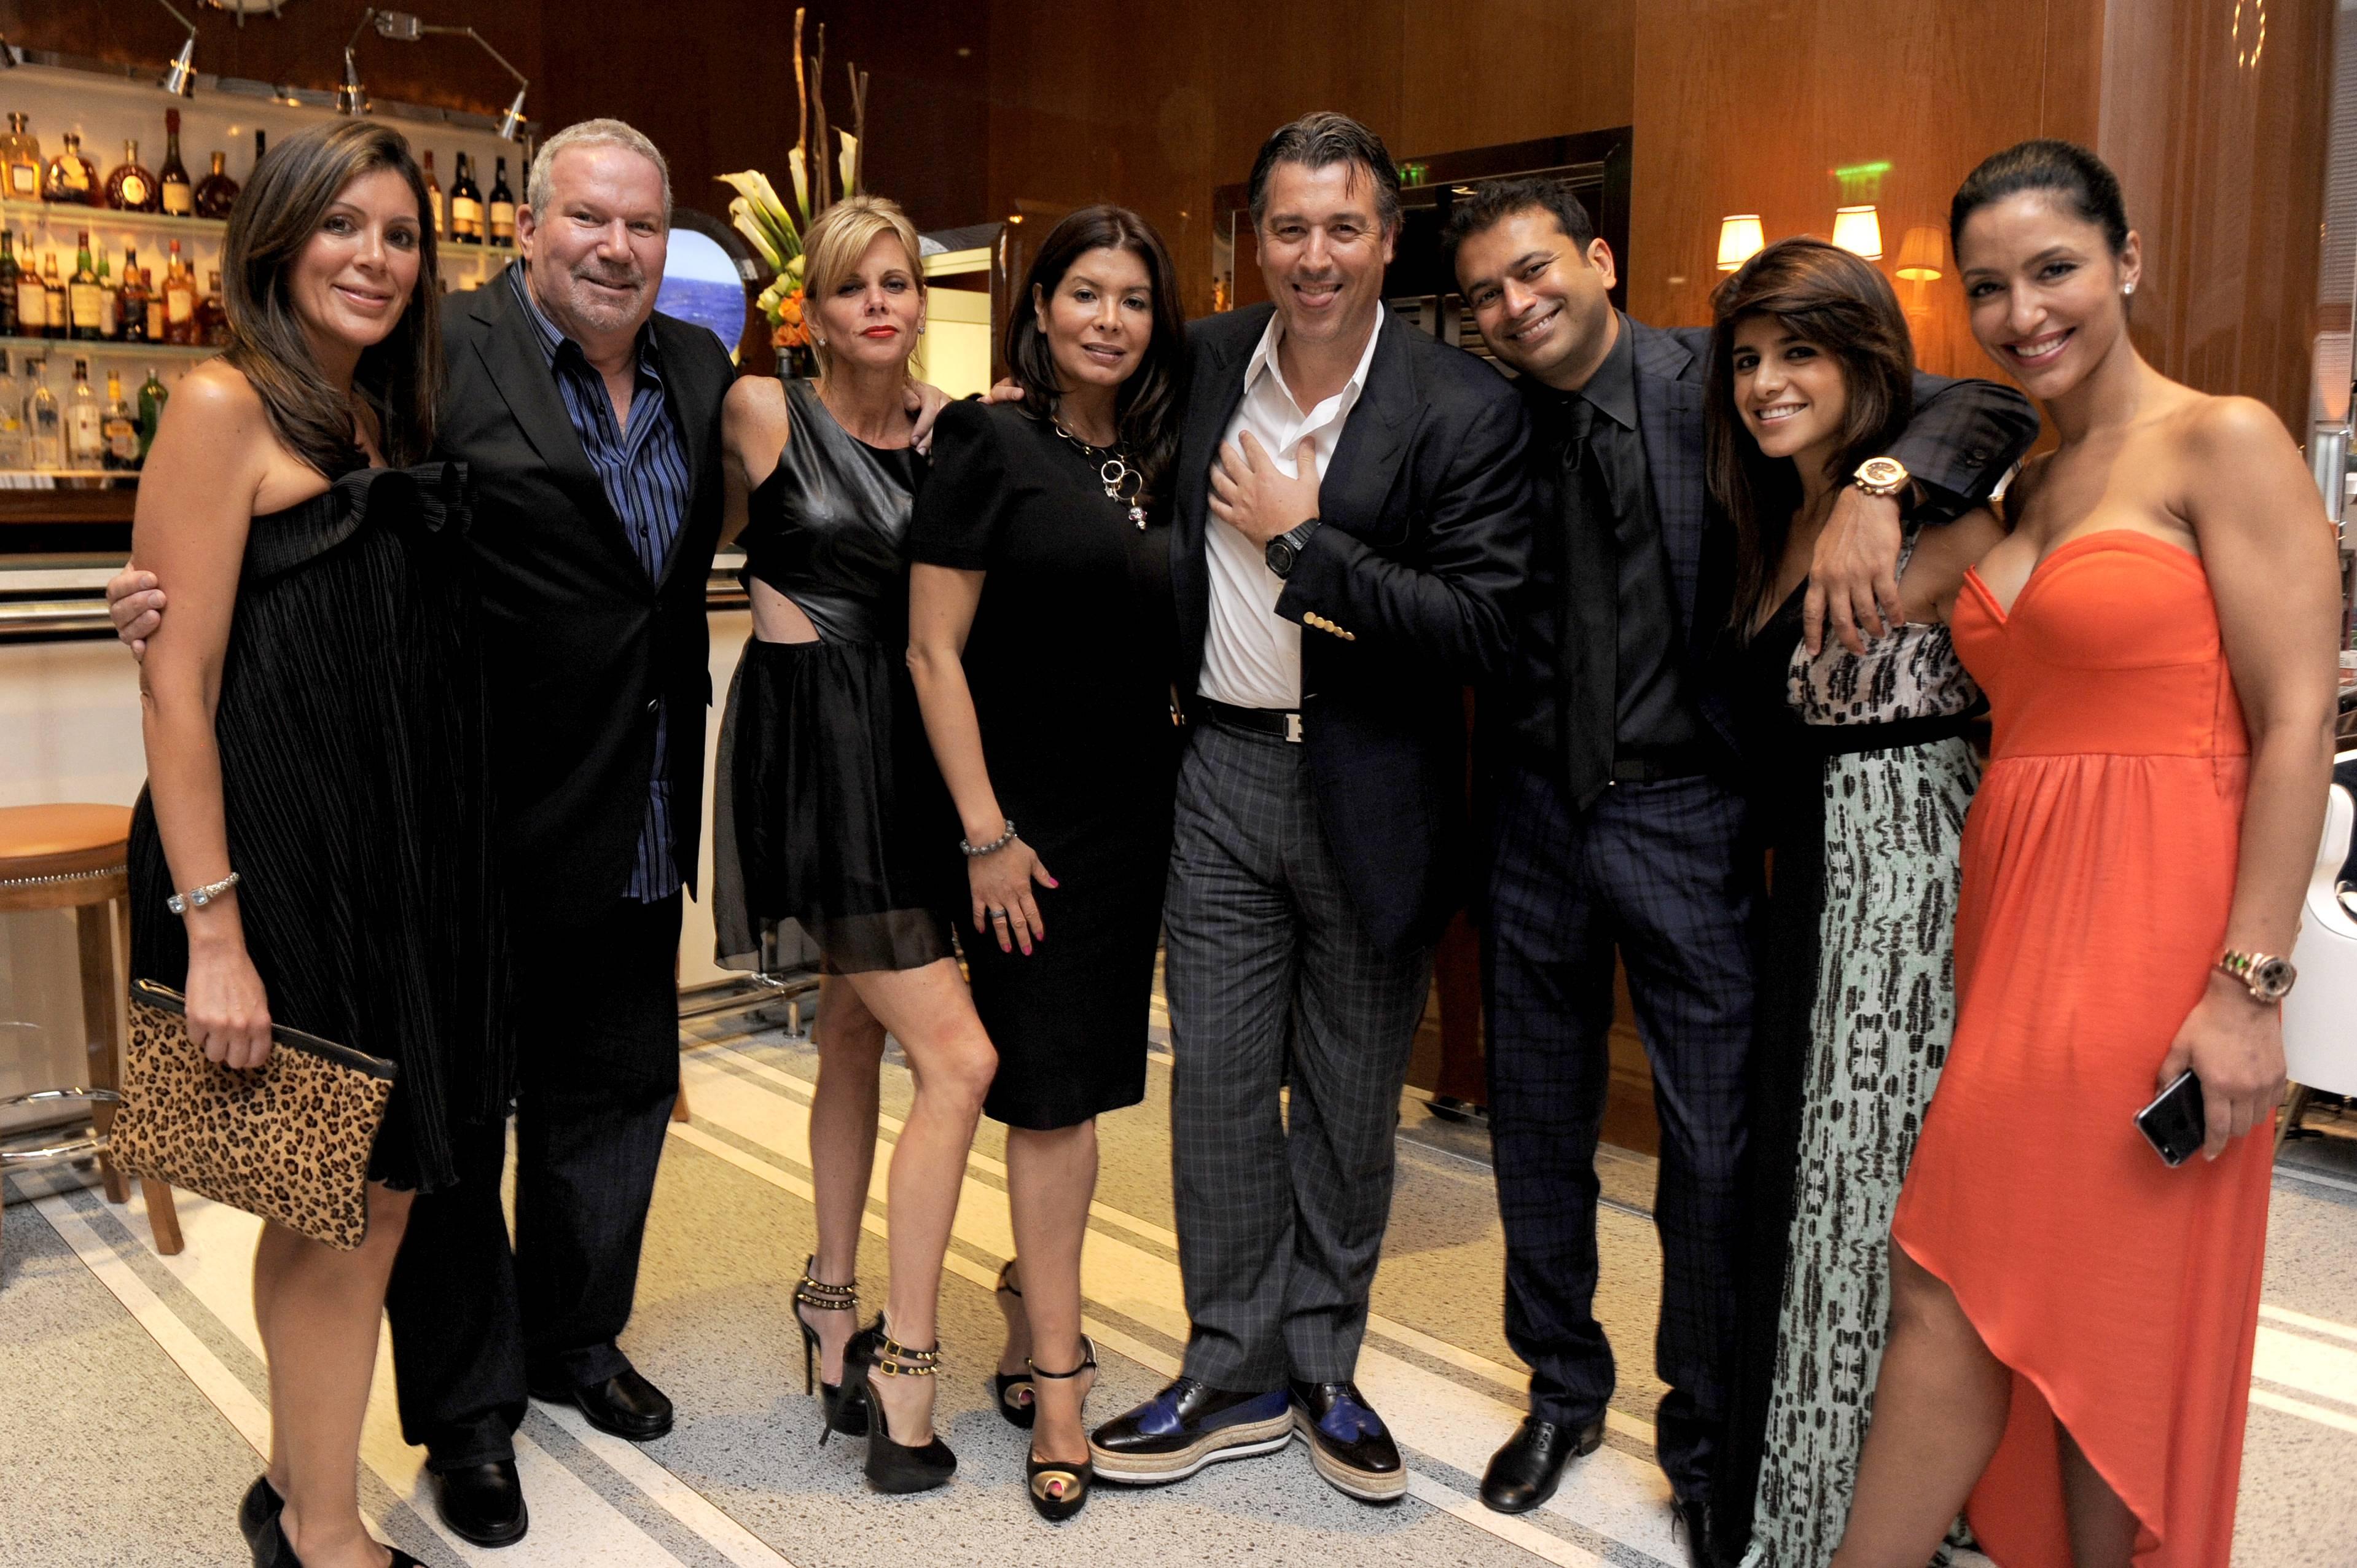 Ken Gorin, Rick De La Croix, Kamal Hotchandani, Paola Rueda, Violet Camacho